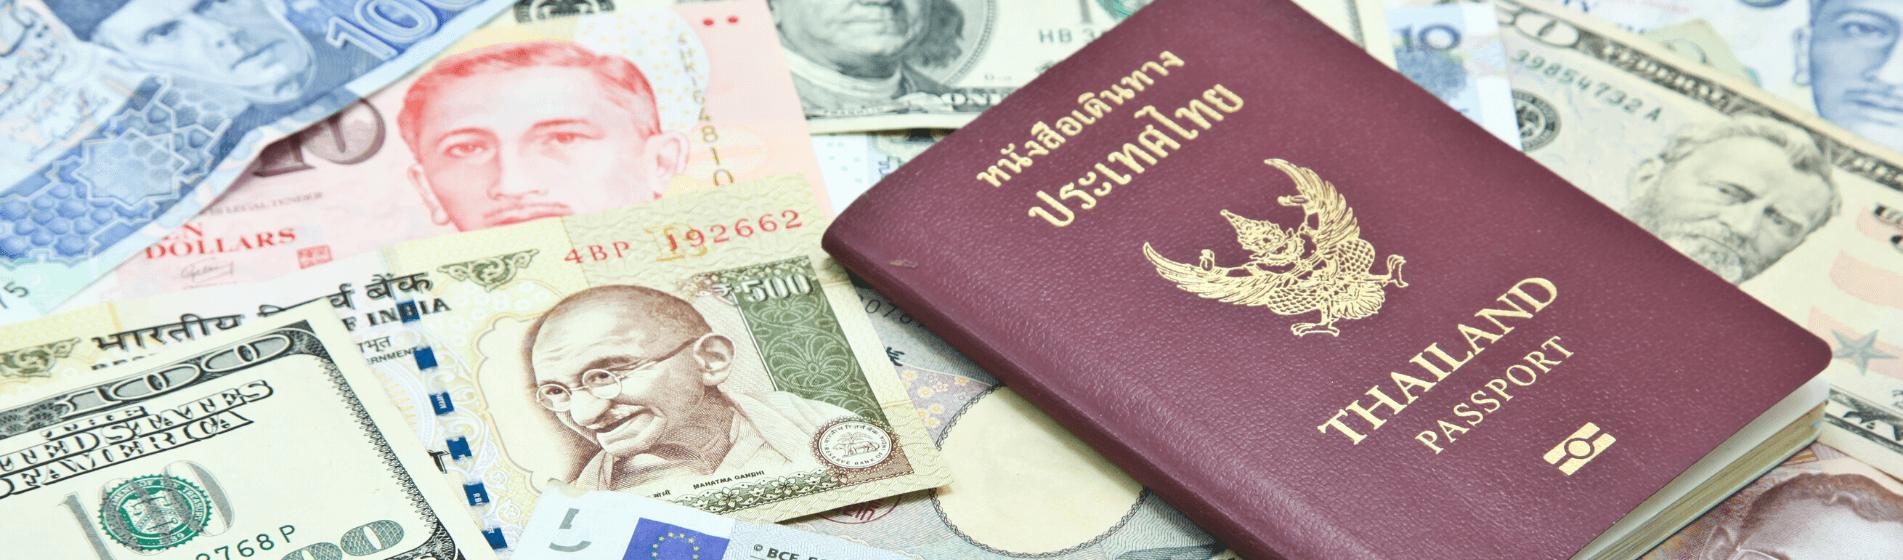 Five Ways to Obtain a Second Citizenship